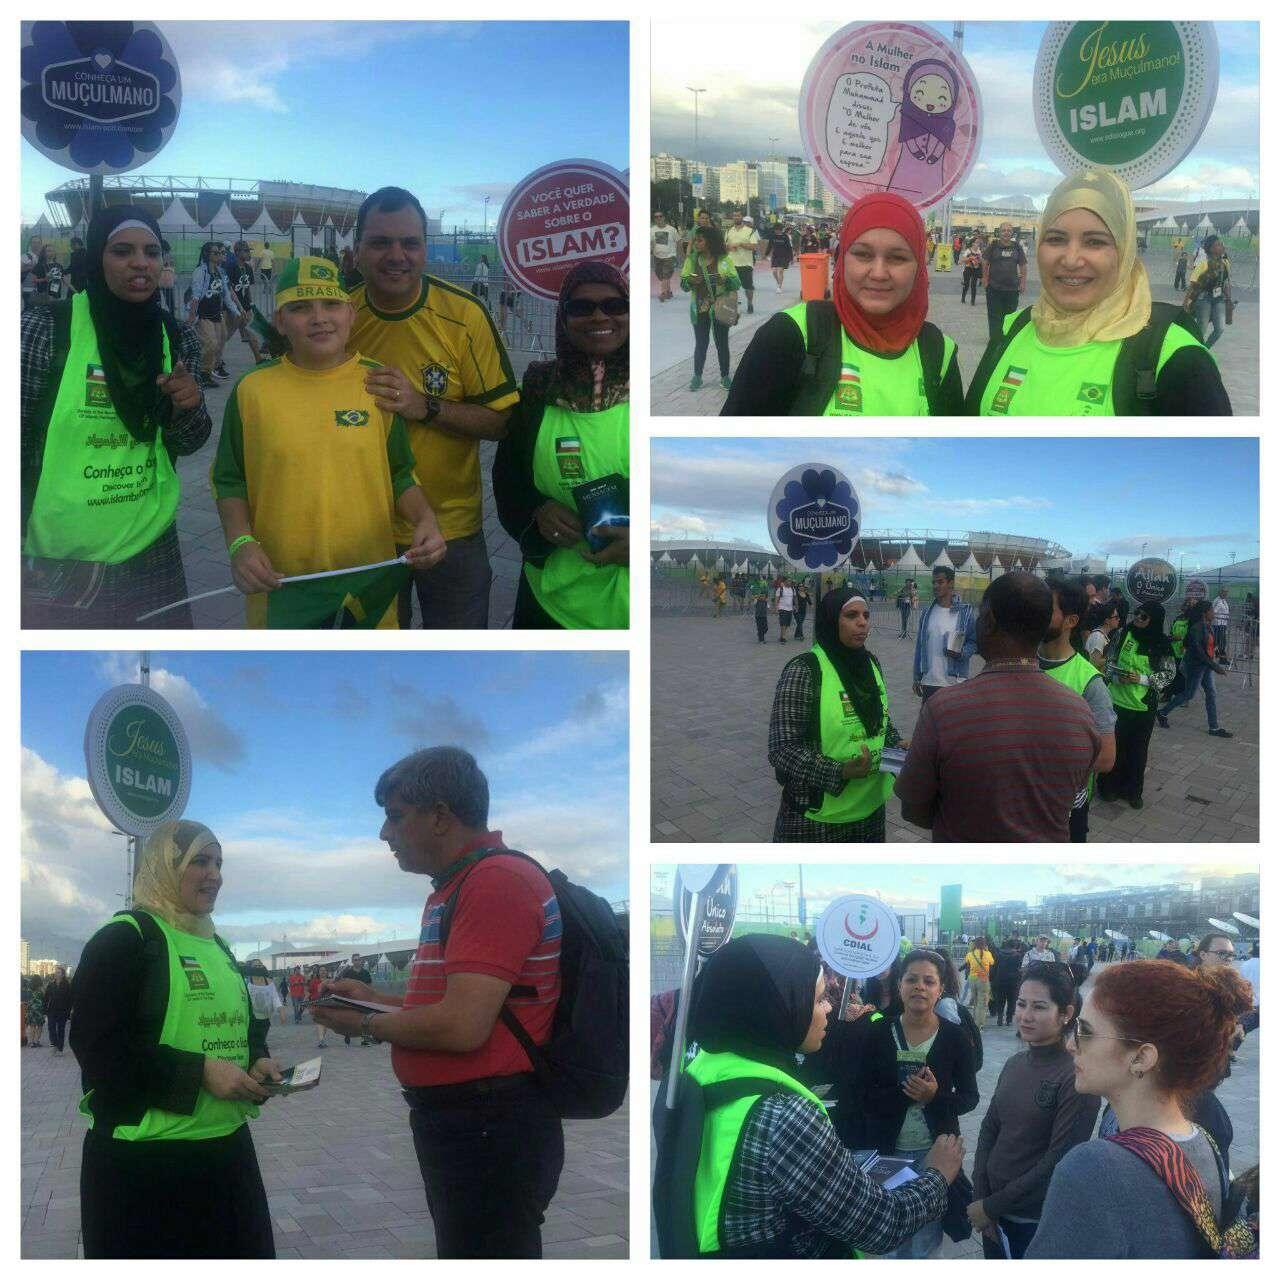 تبلیغ اسلام در المپیک ریو